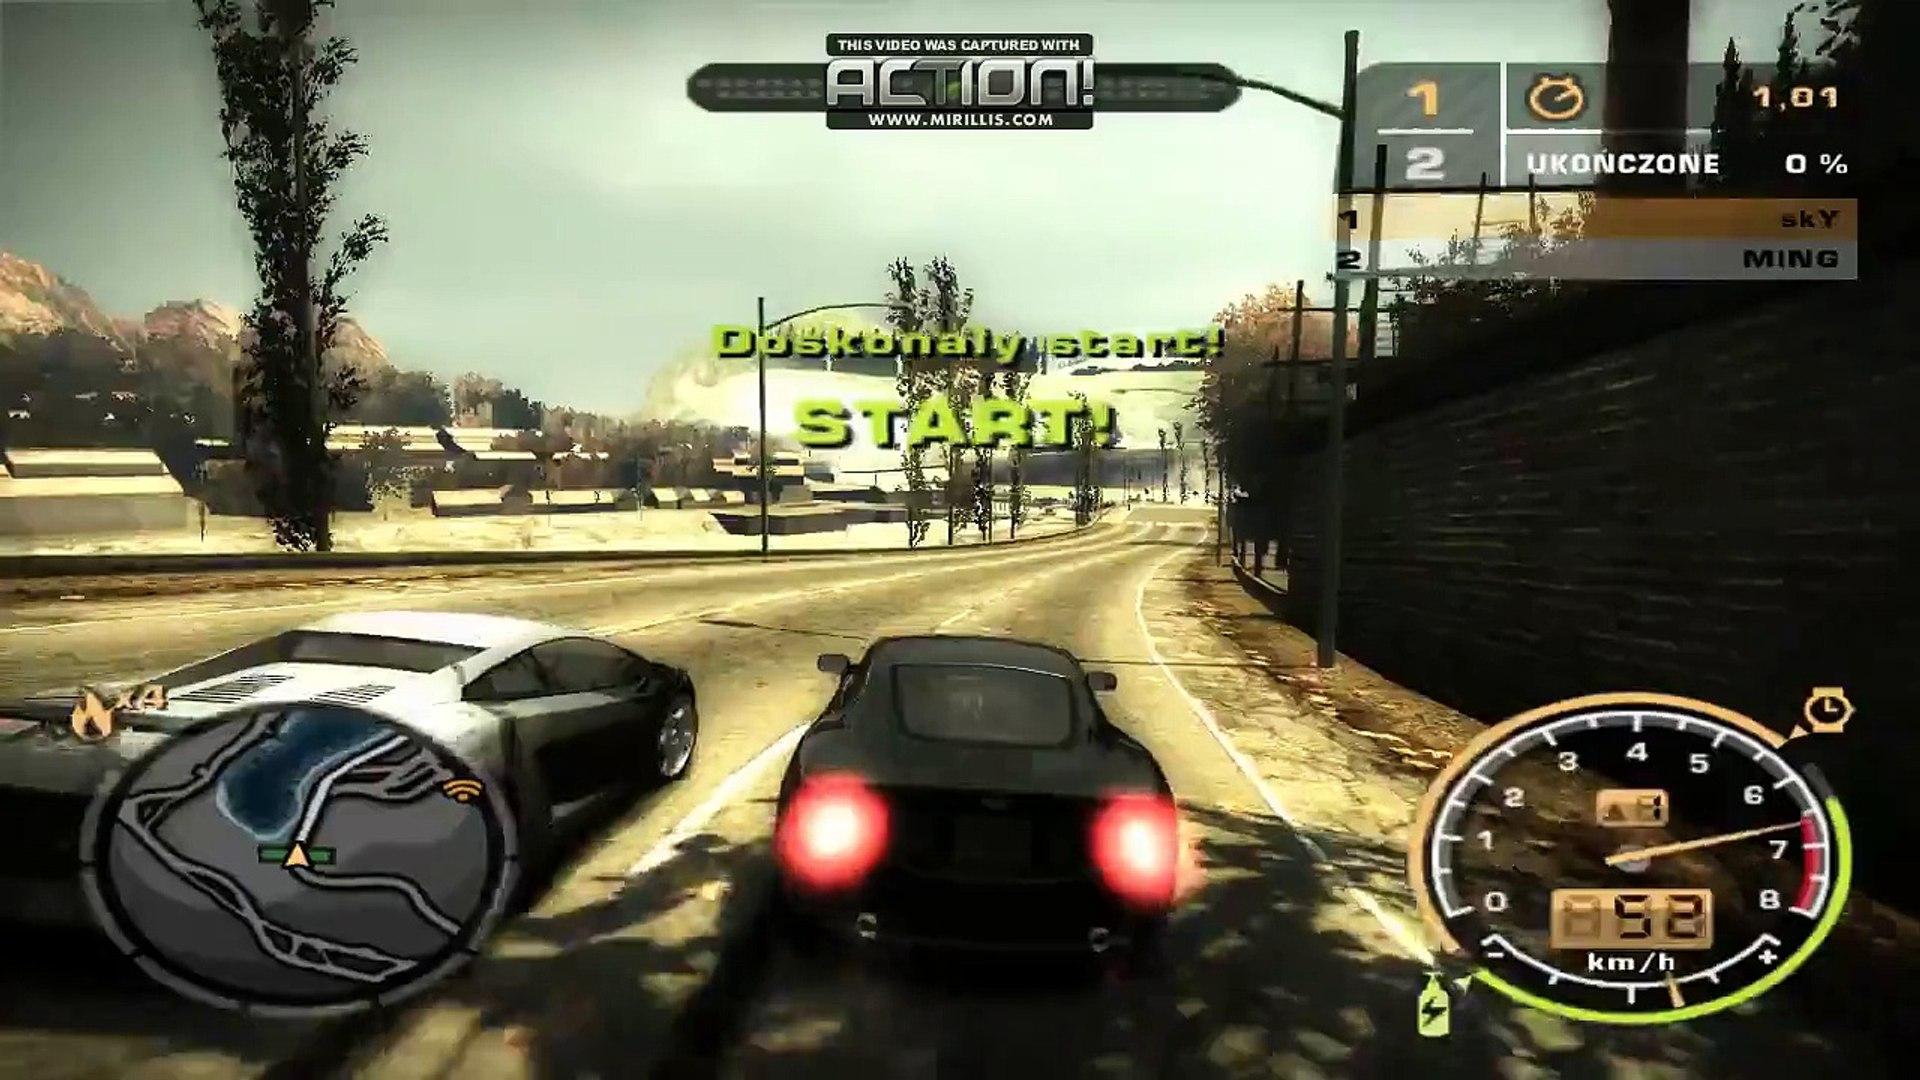 Nfs Most Wanted Aston Martin Db9 Vs Ming Blacklist 6 Video Dailymotion